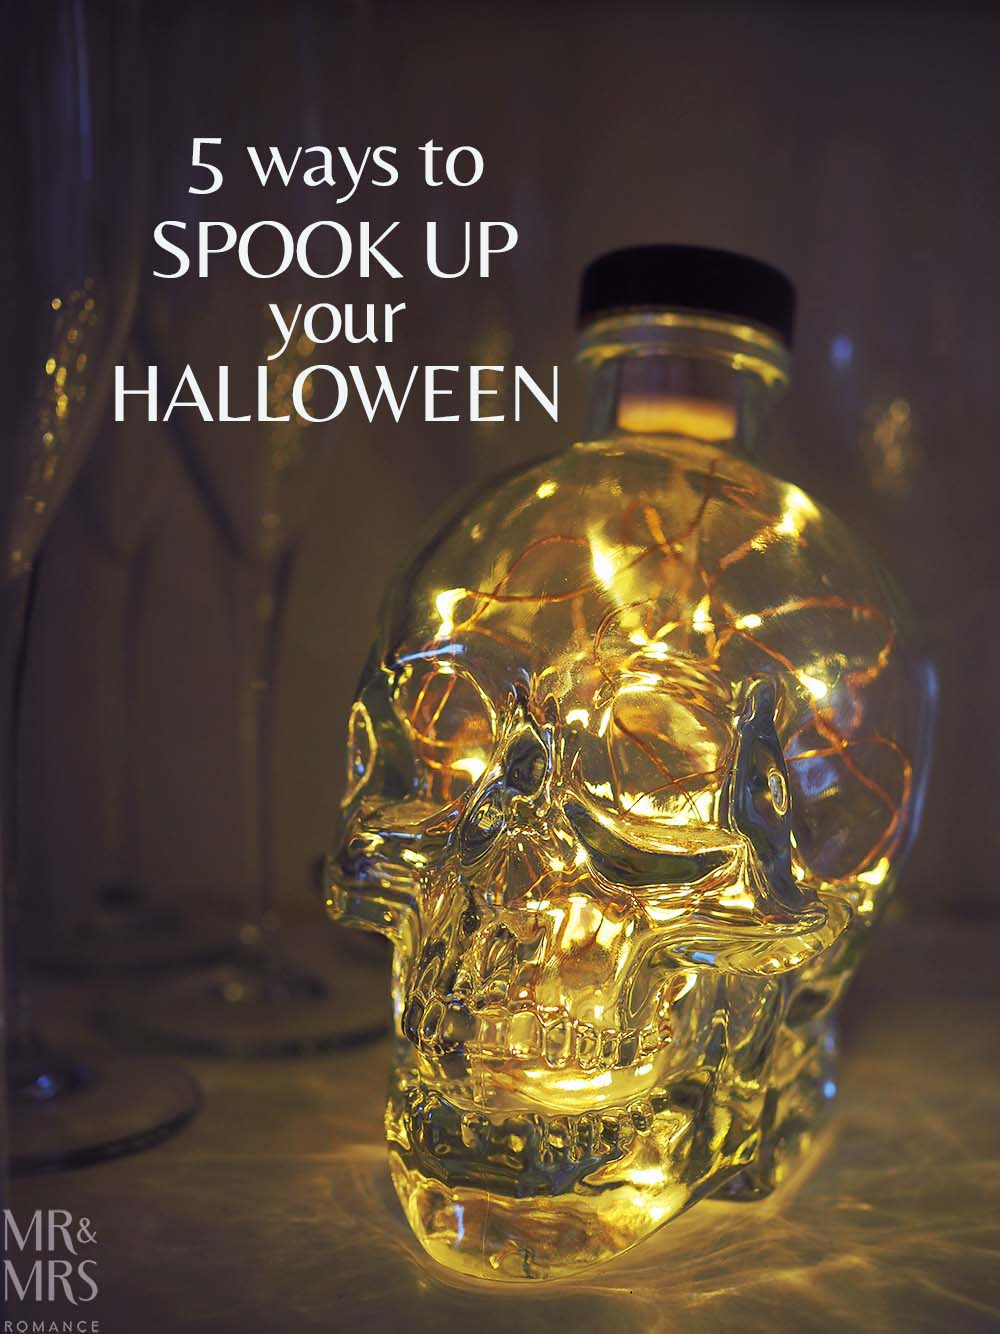 Halloween party ideas - MMR